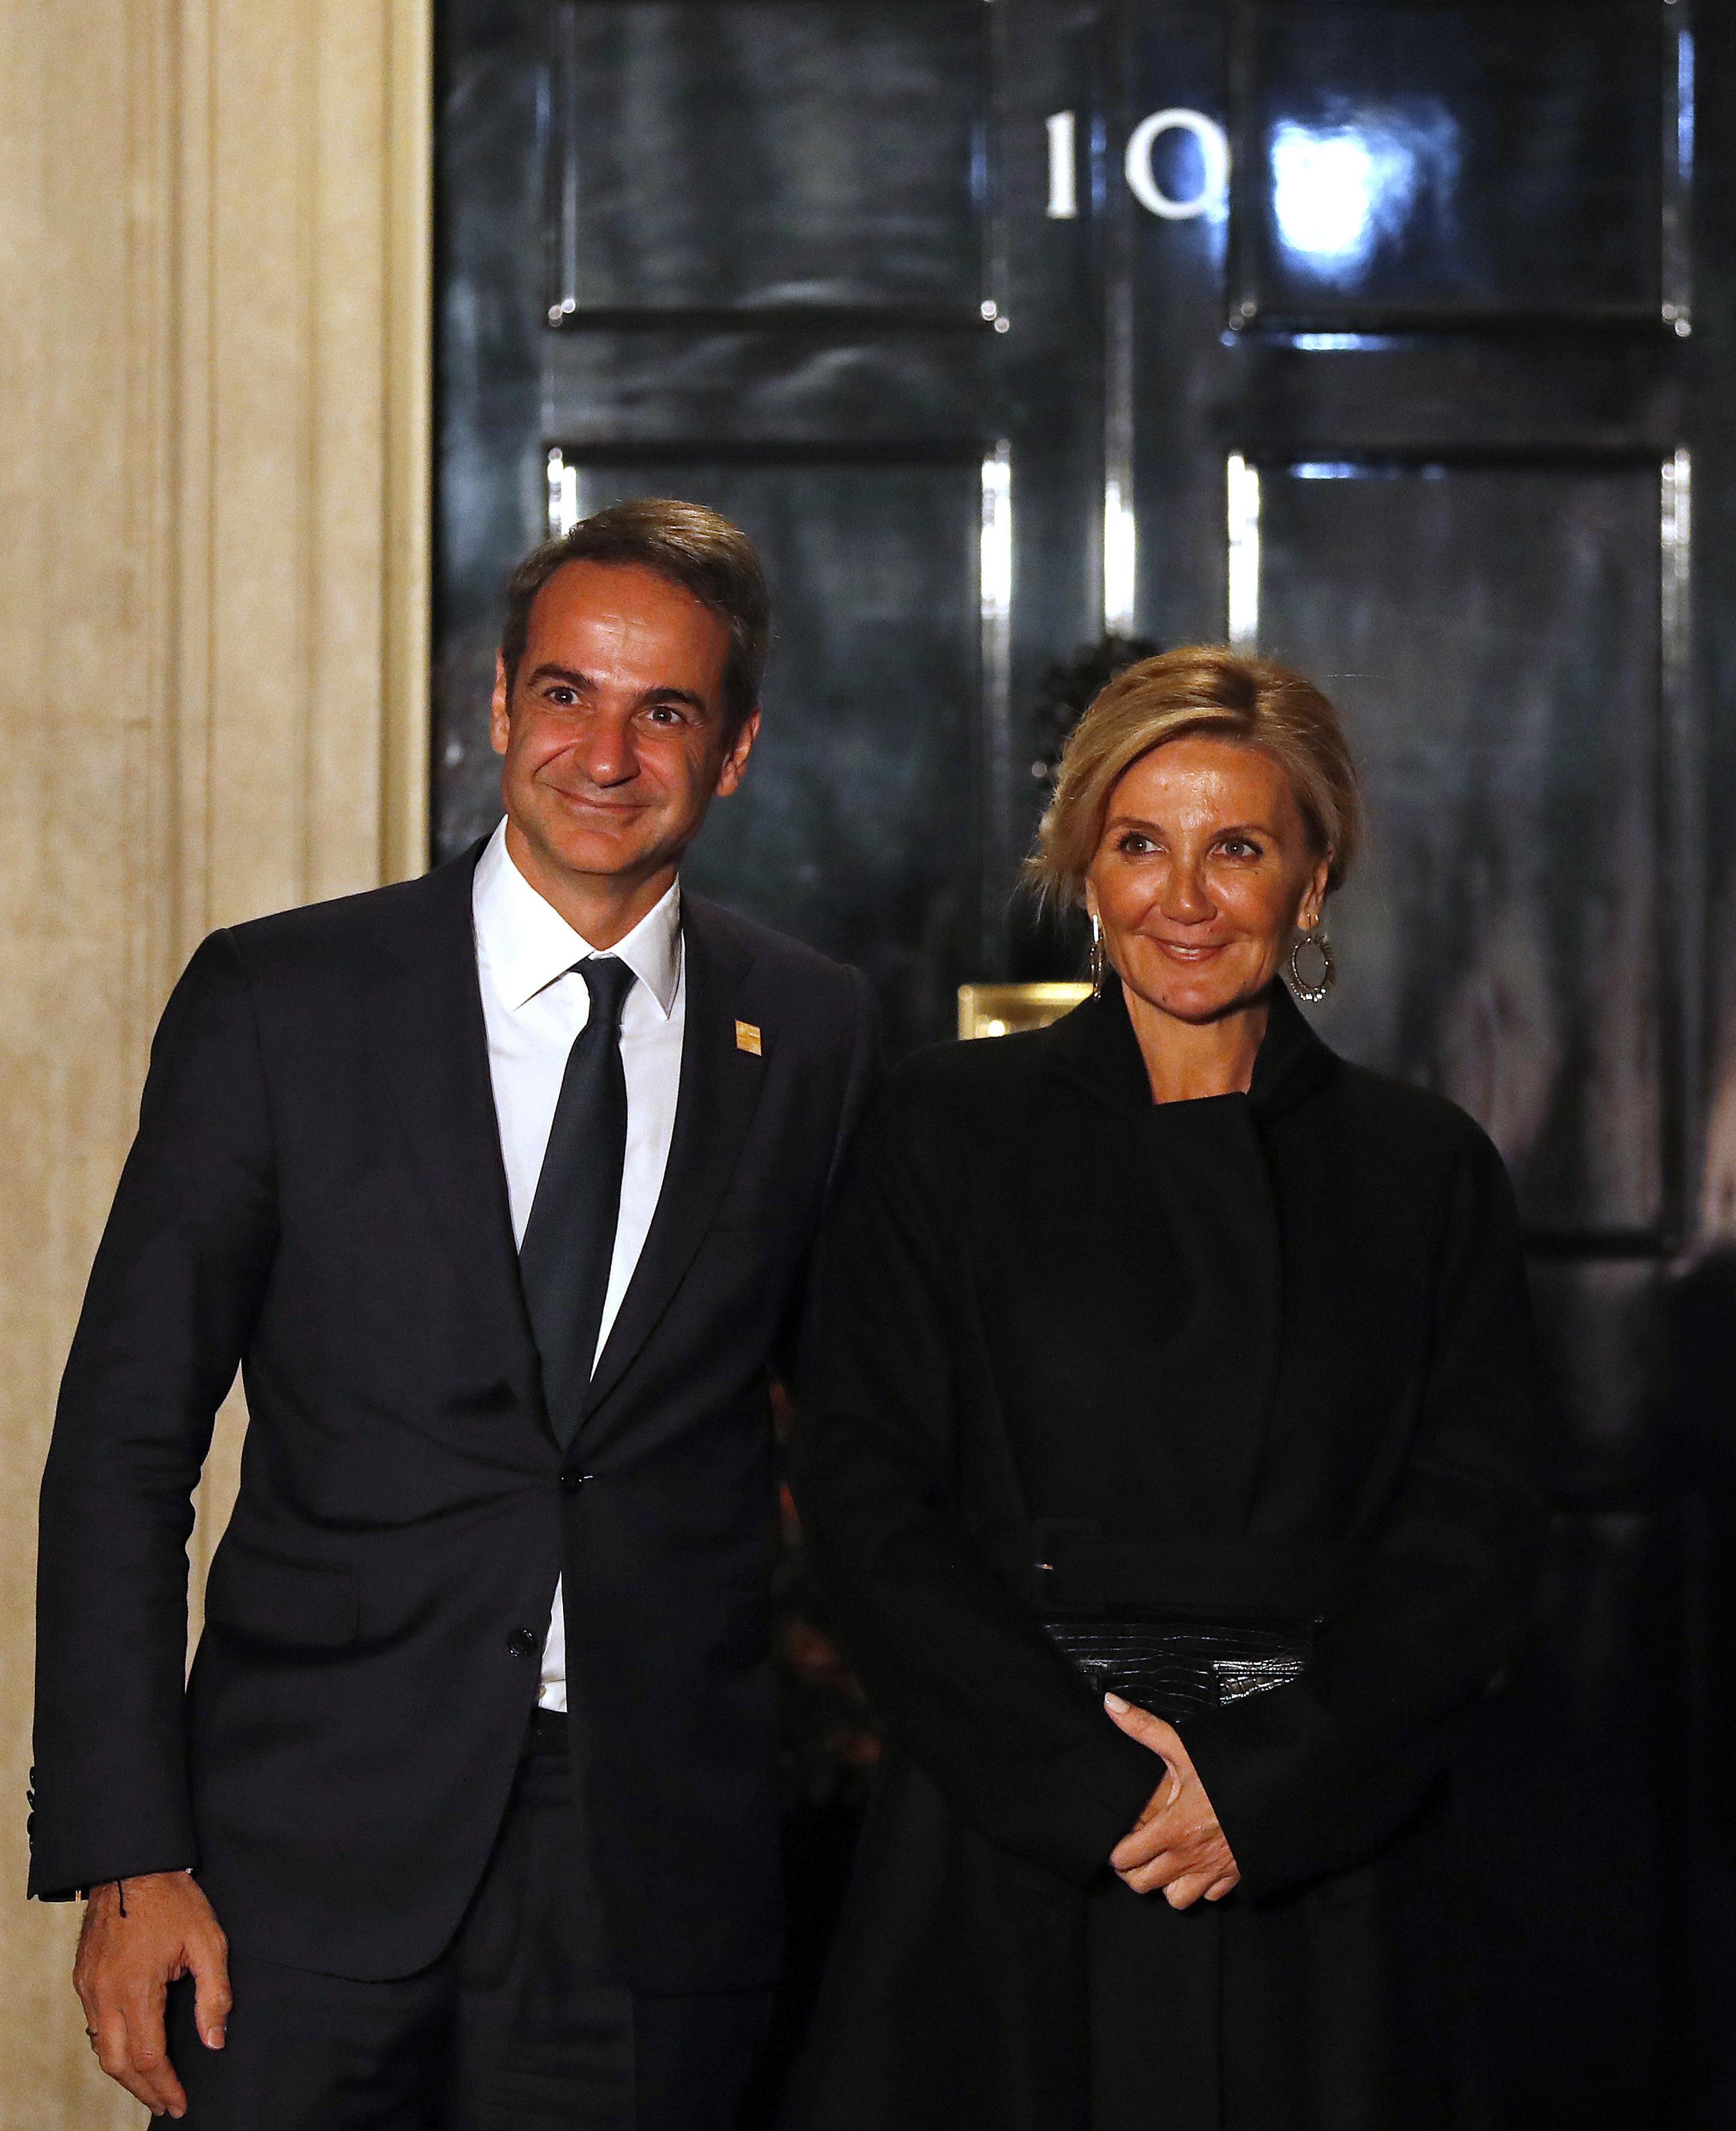 <p>Кириакос Мицотакис и съпругата му</p>